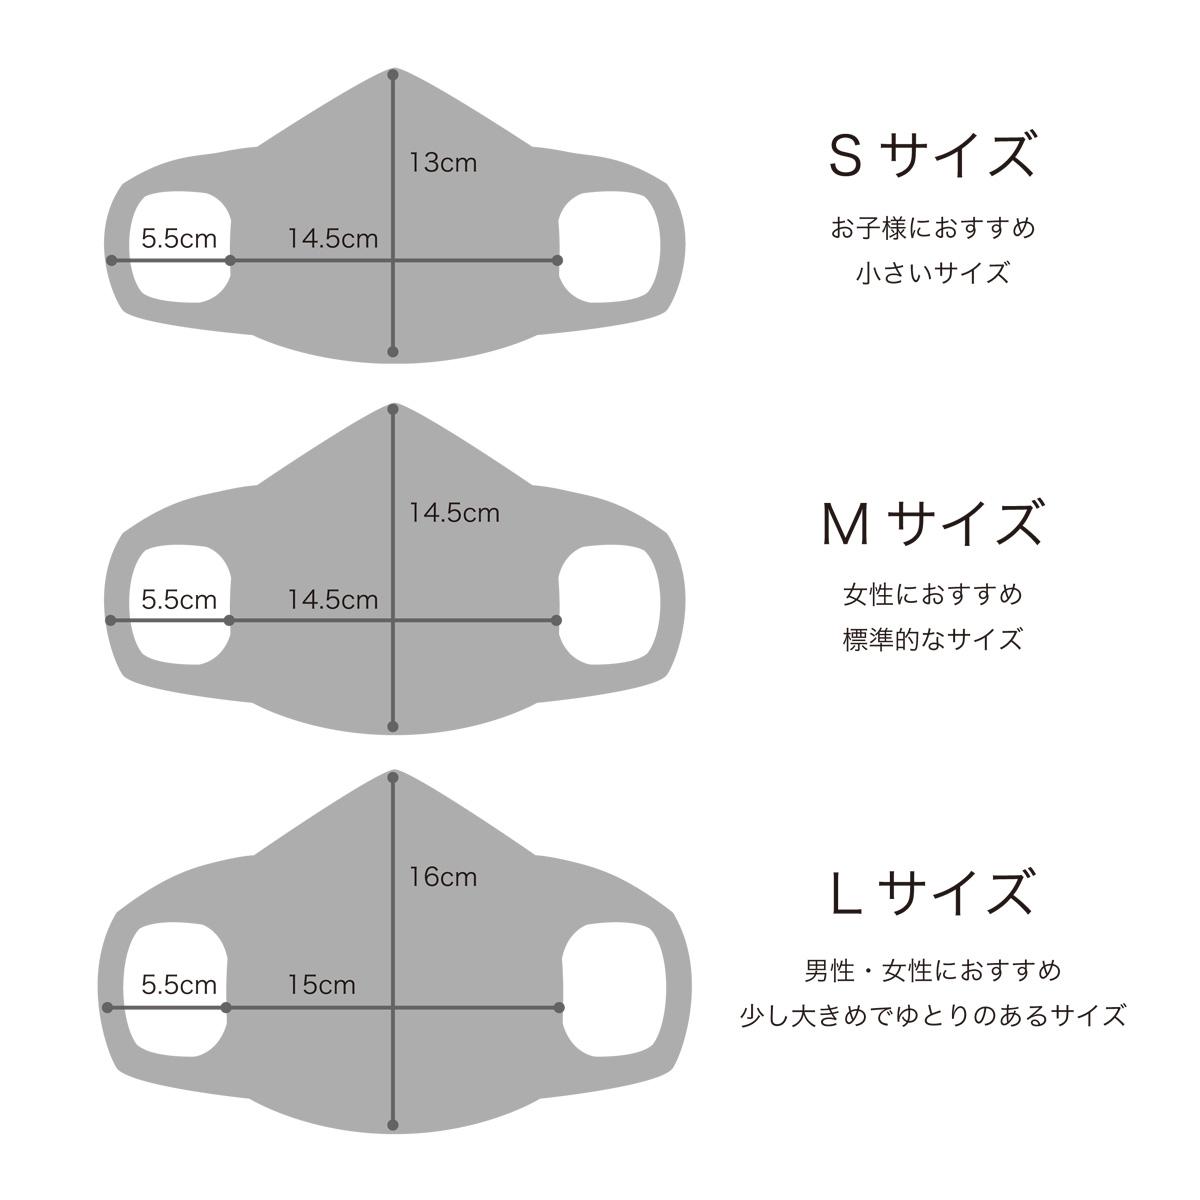 3Dフェイスマスク オーガニックコットン洛陽染め 紅【S・M・Lサイズ】